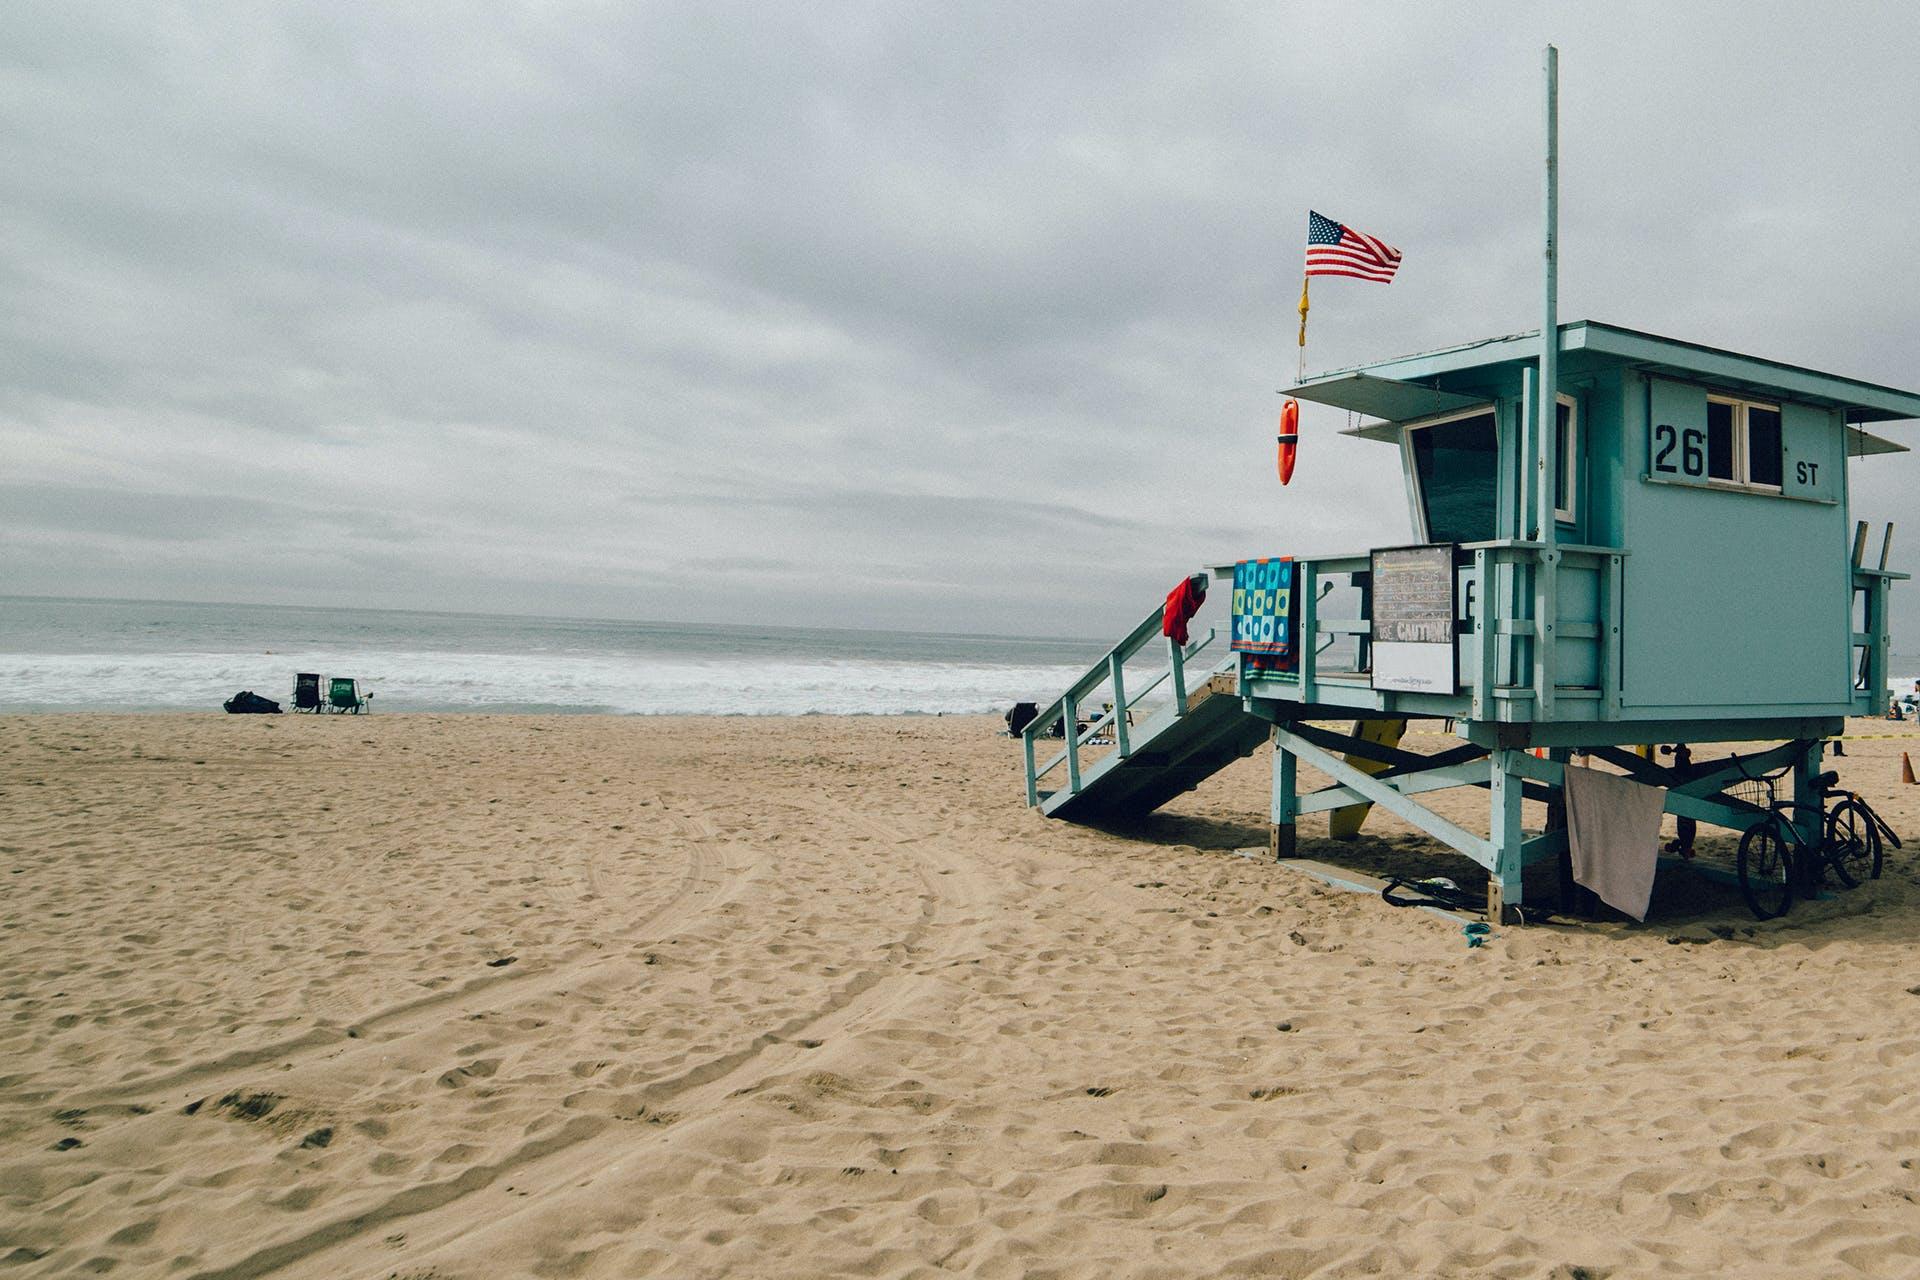 Lifeguard House at Beach